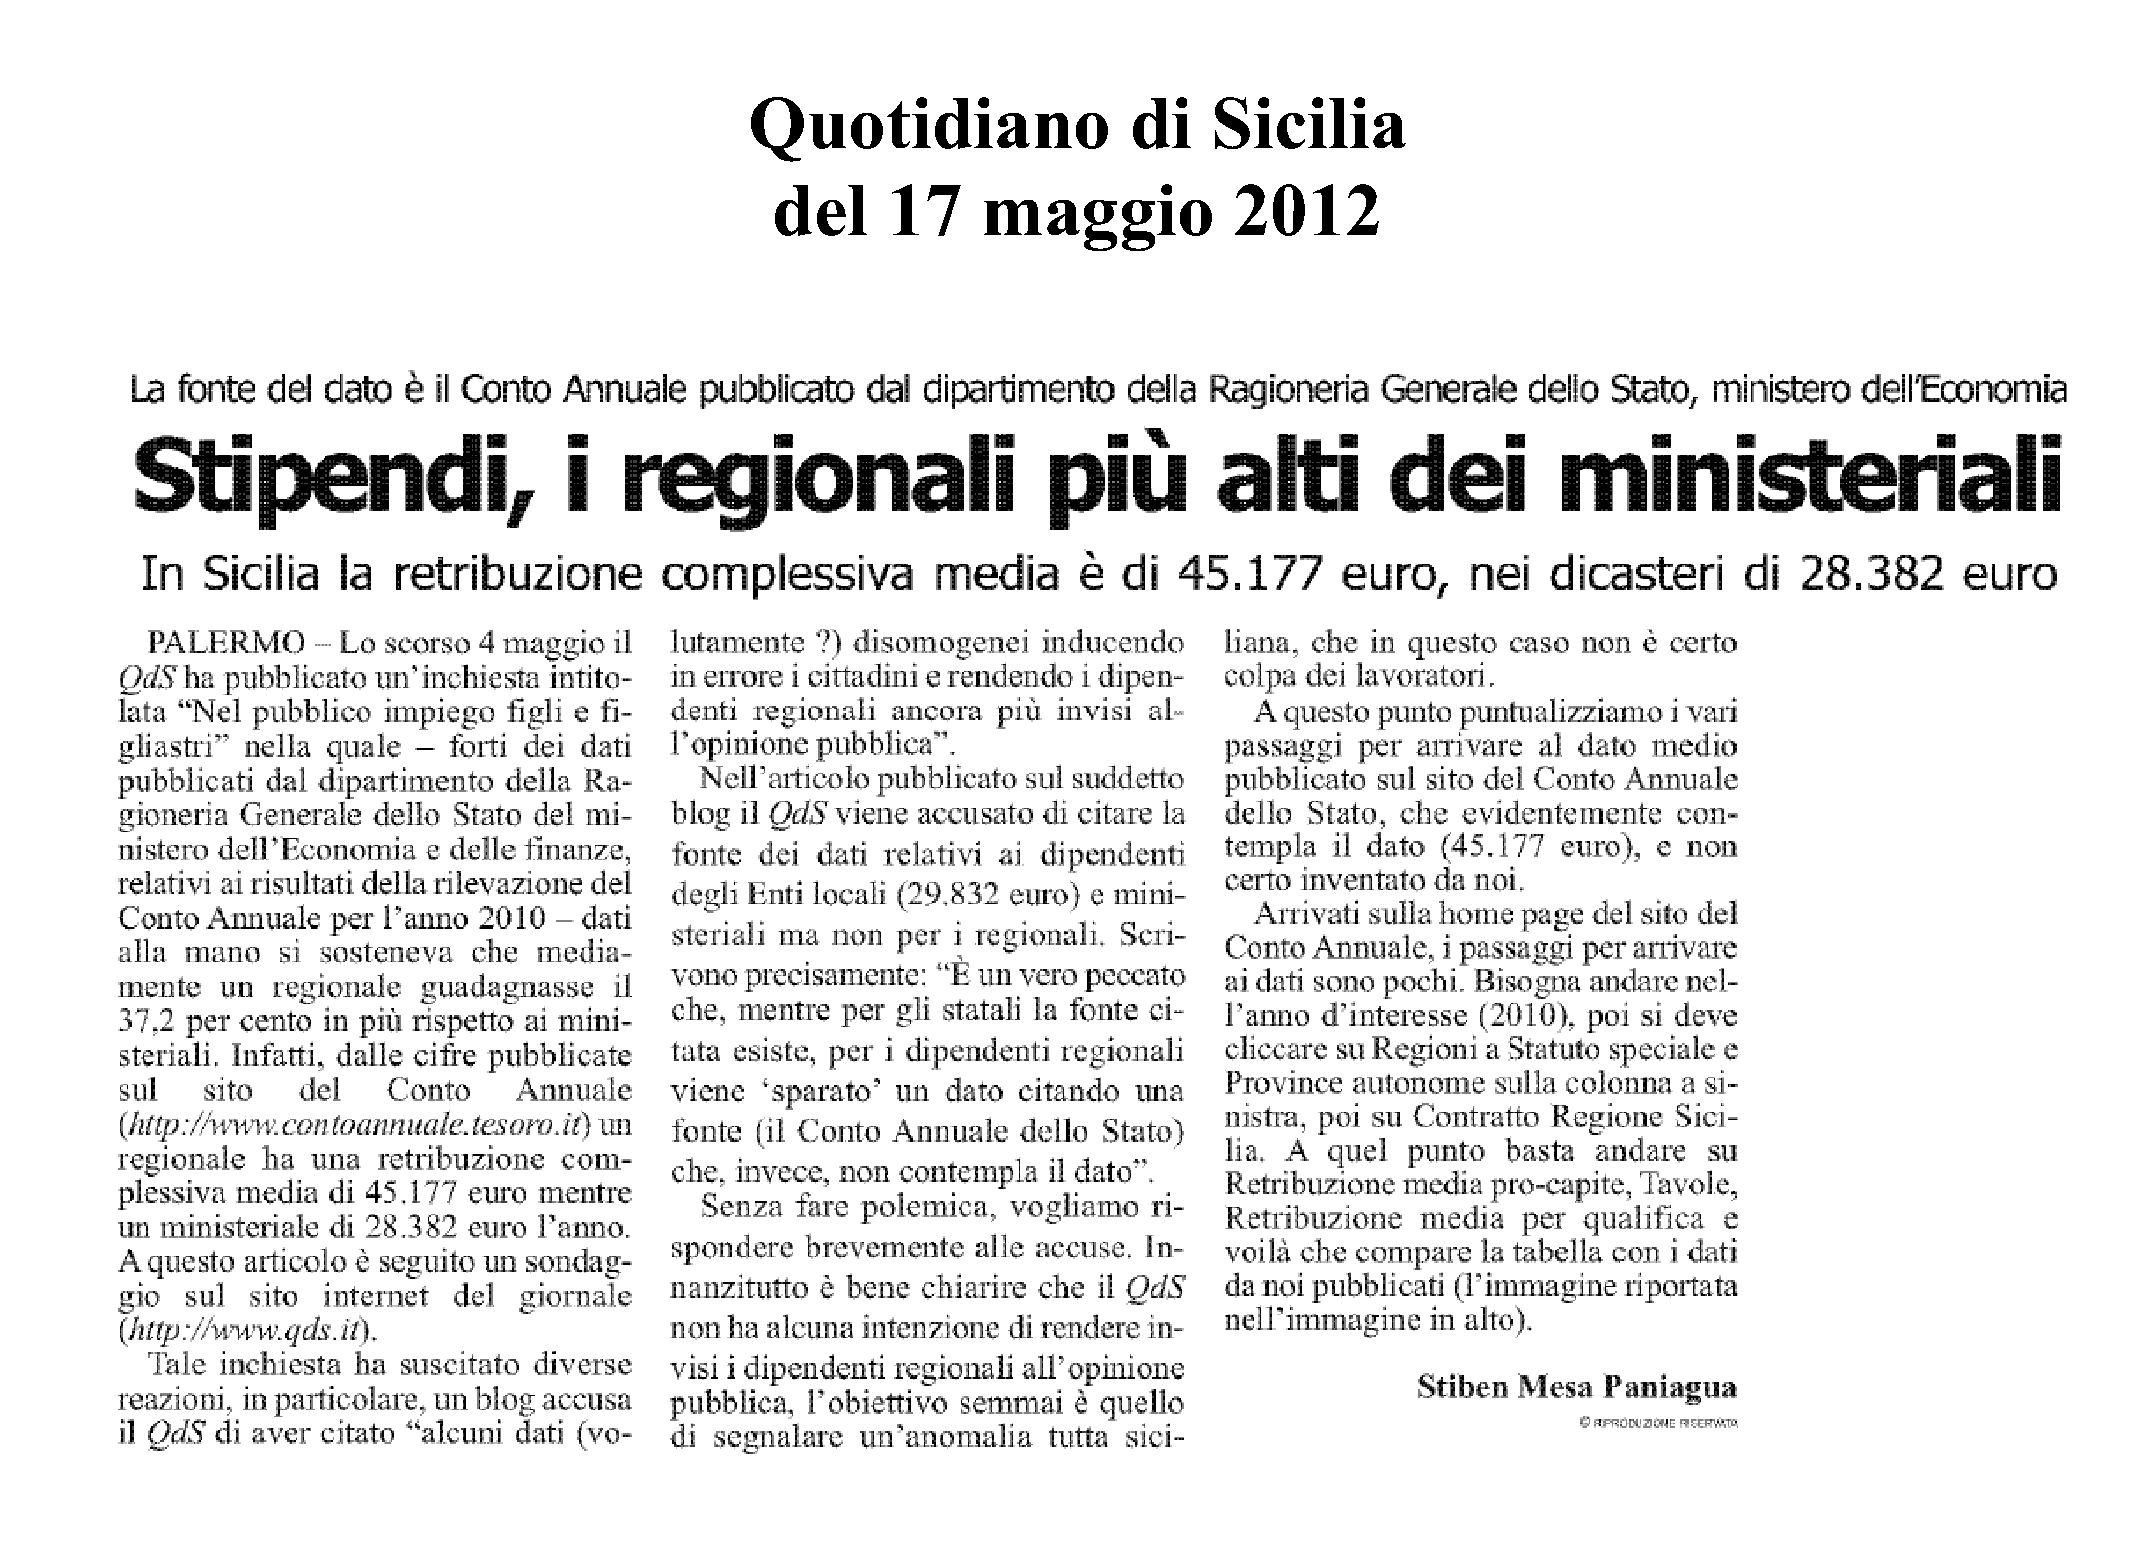 cud regione sicilia